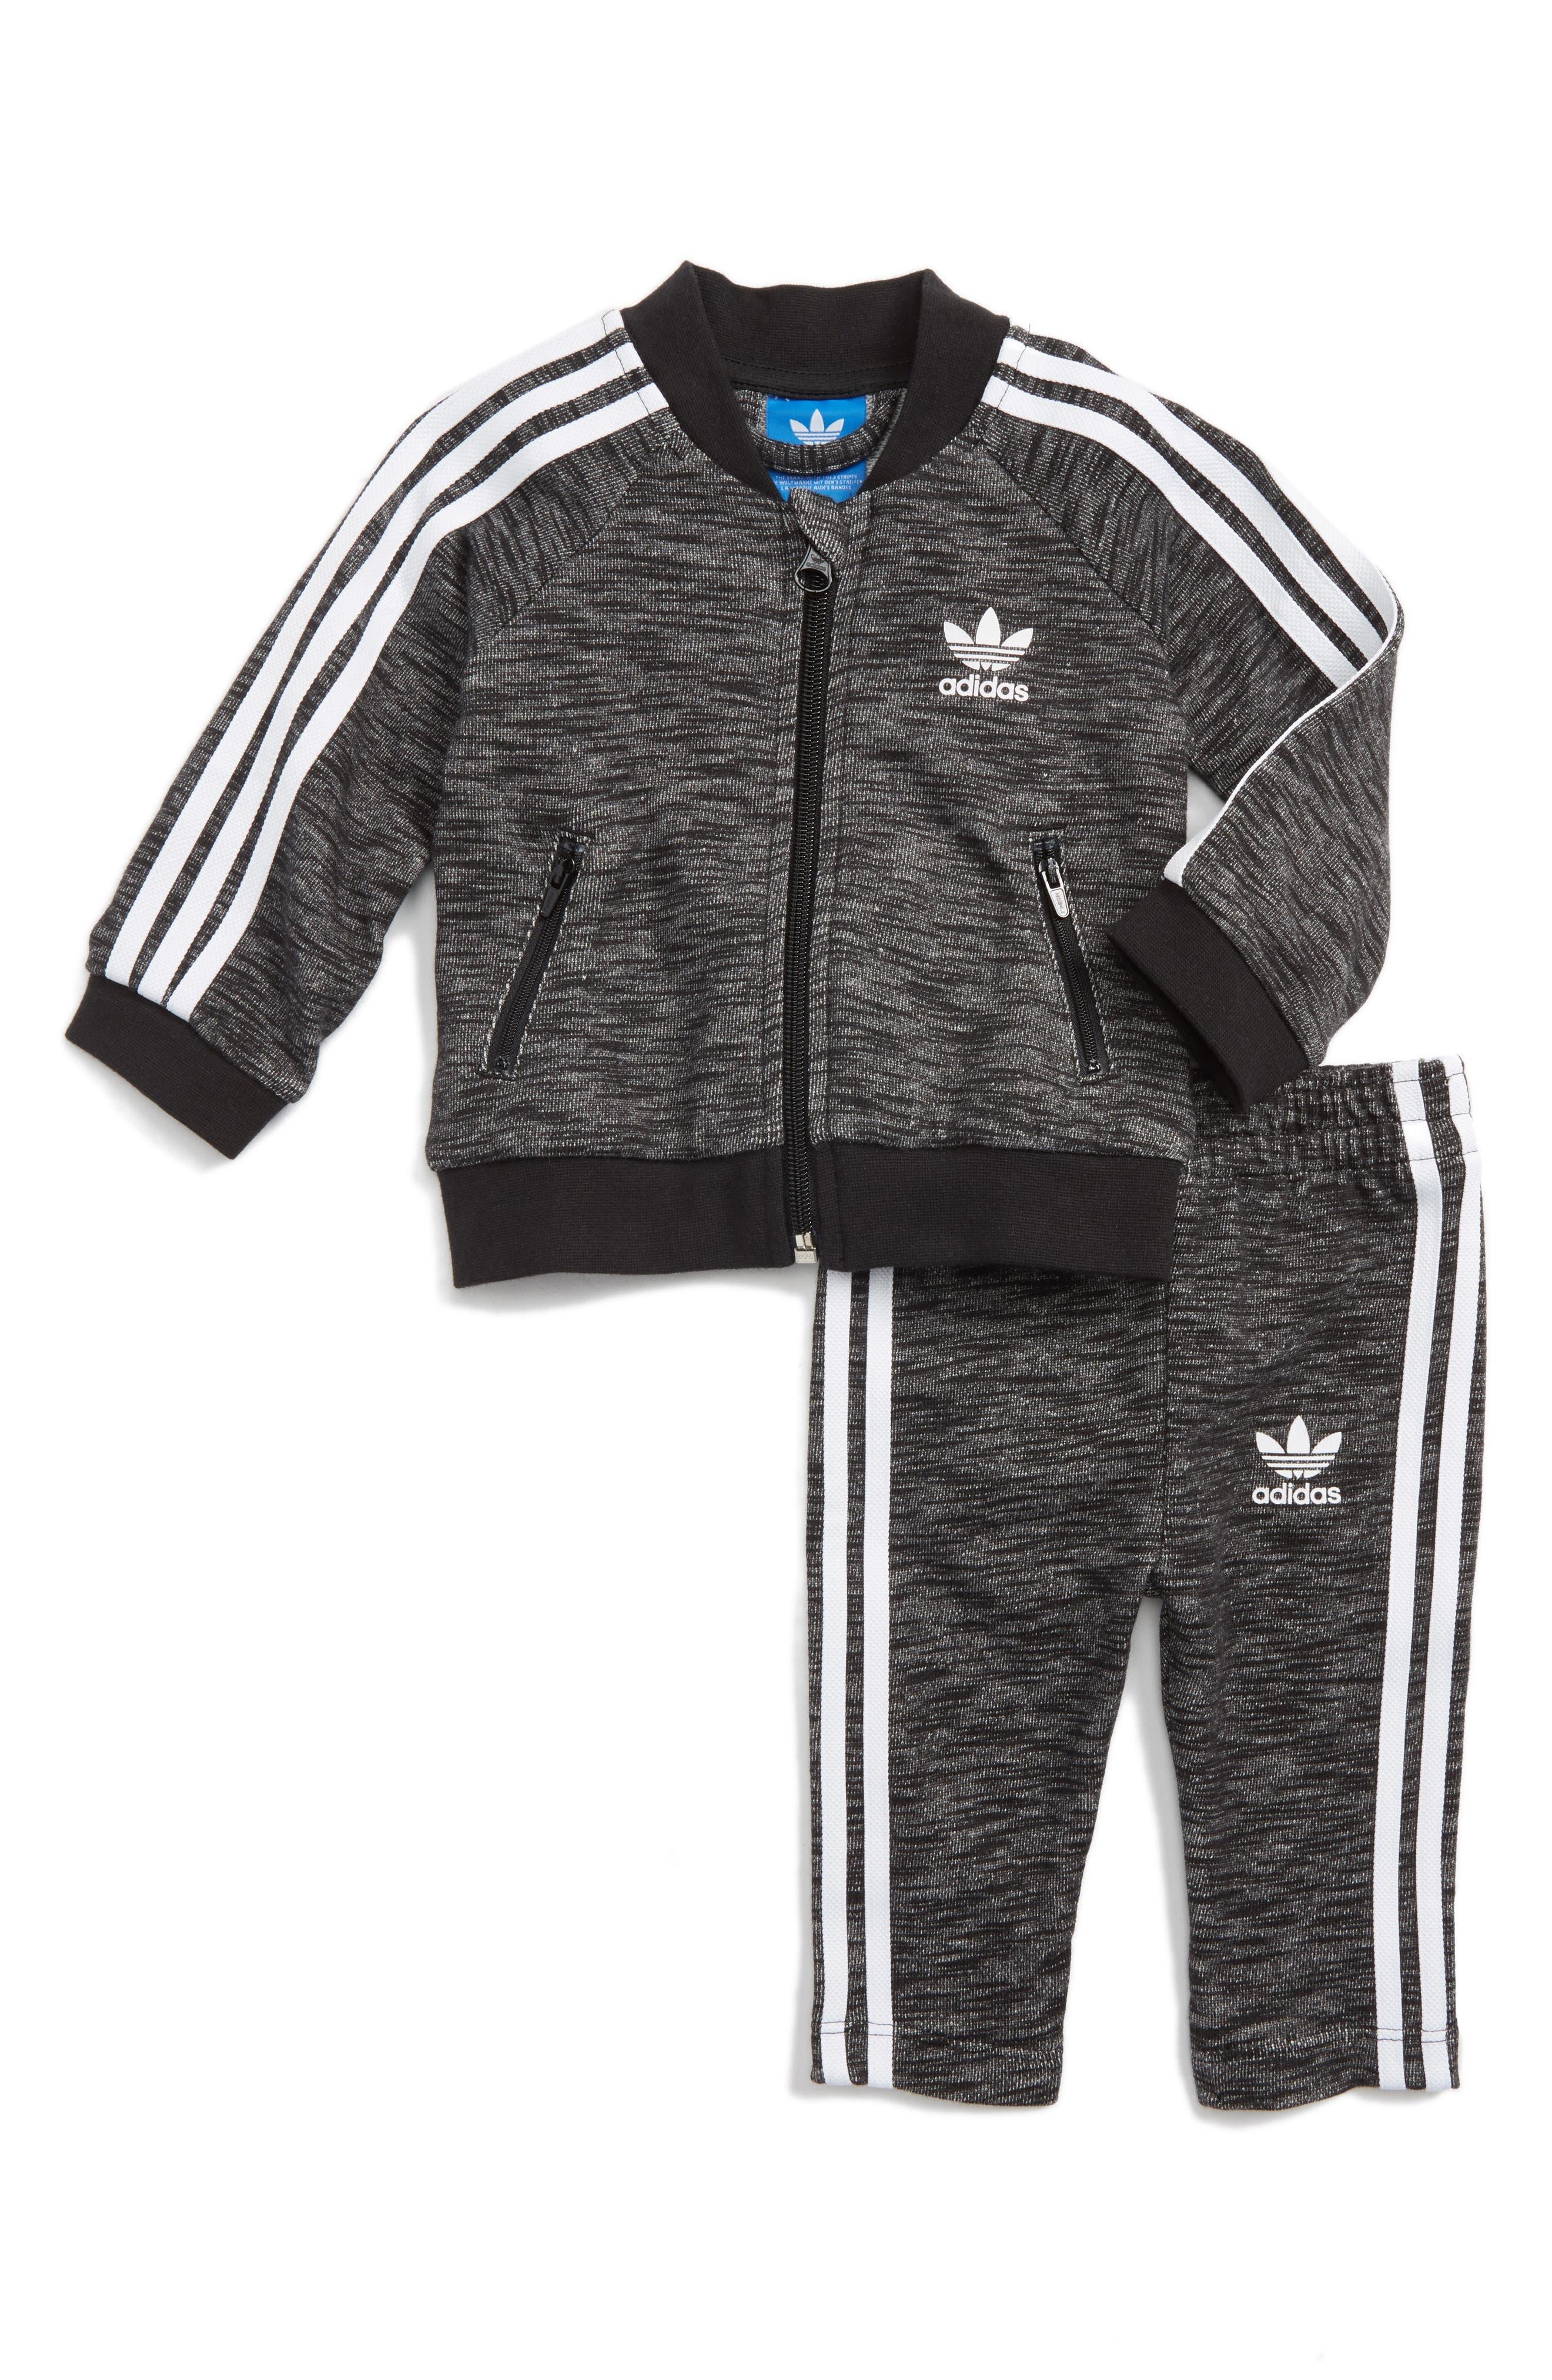 Alternate Image 1 Selected - adidas Originals Superstar Track Jacket & Pants Set (Baby)